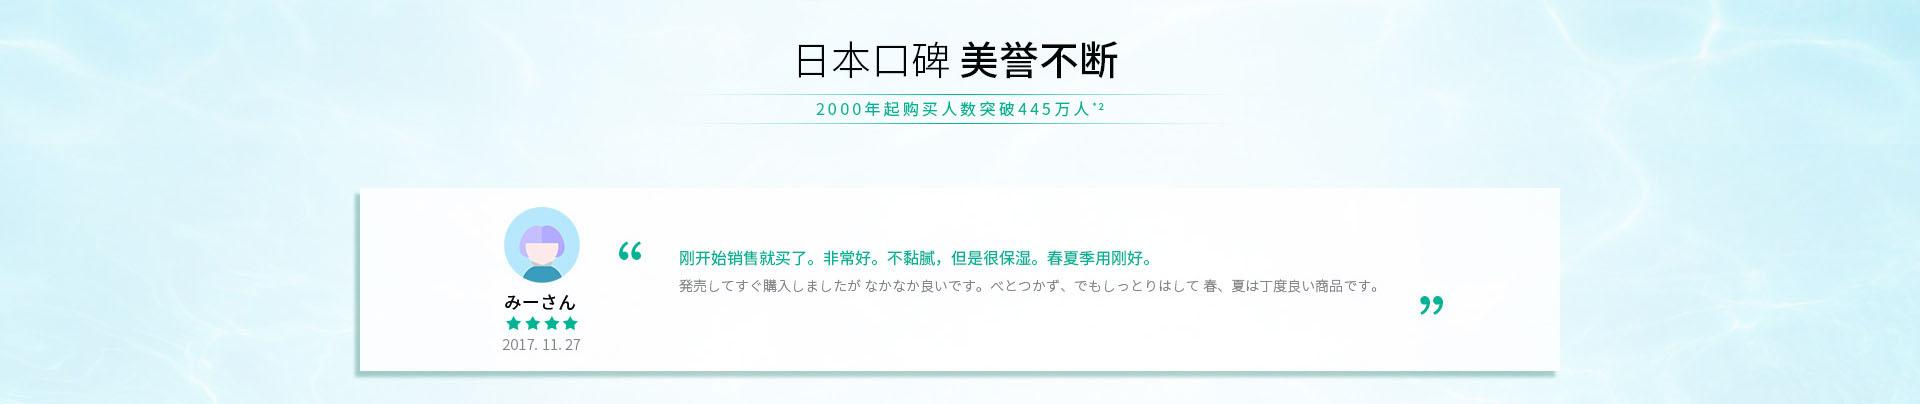 orbis奥蜜思水原力404